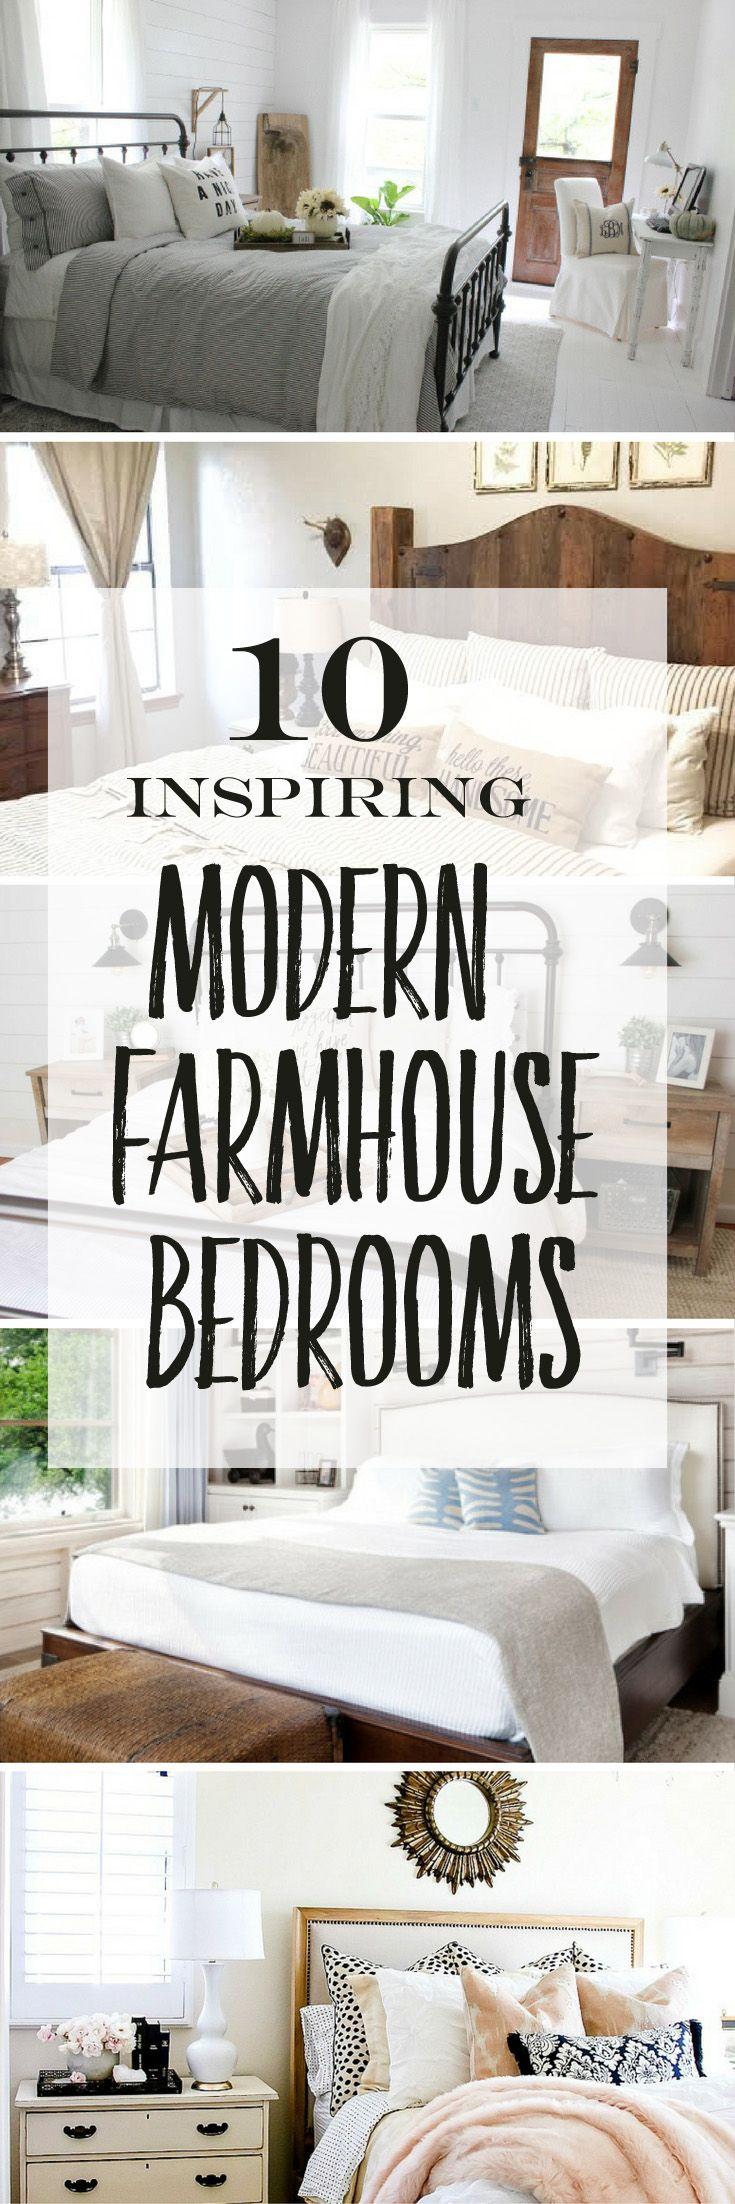 Modern Farmhouse Bedrooms #modernfarmhousebedroom